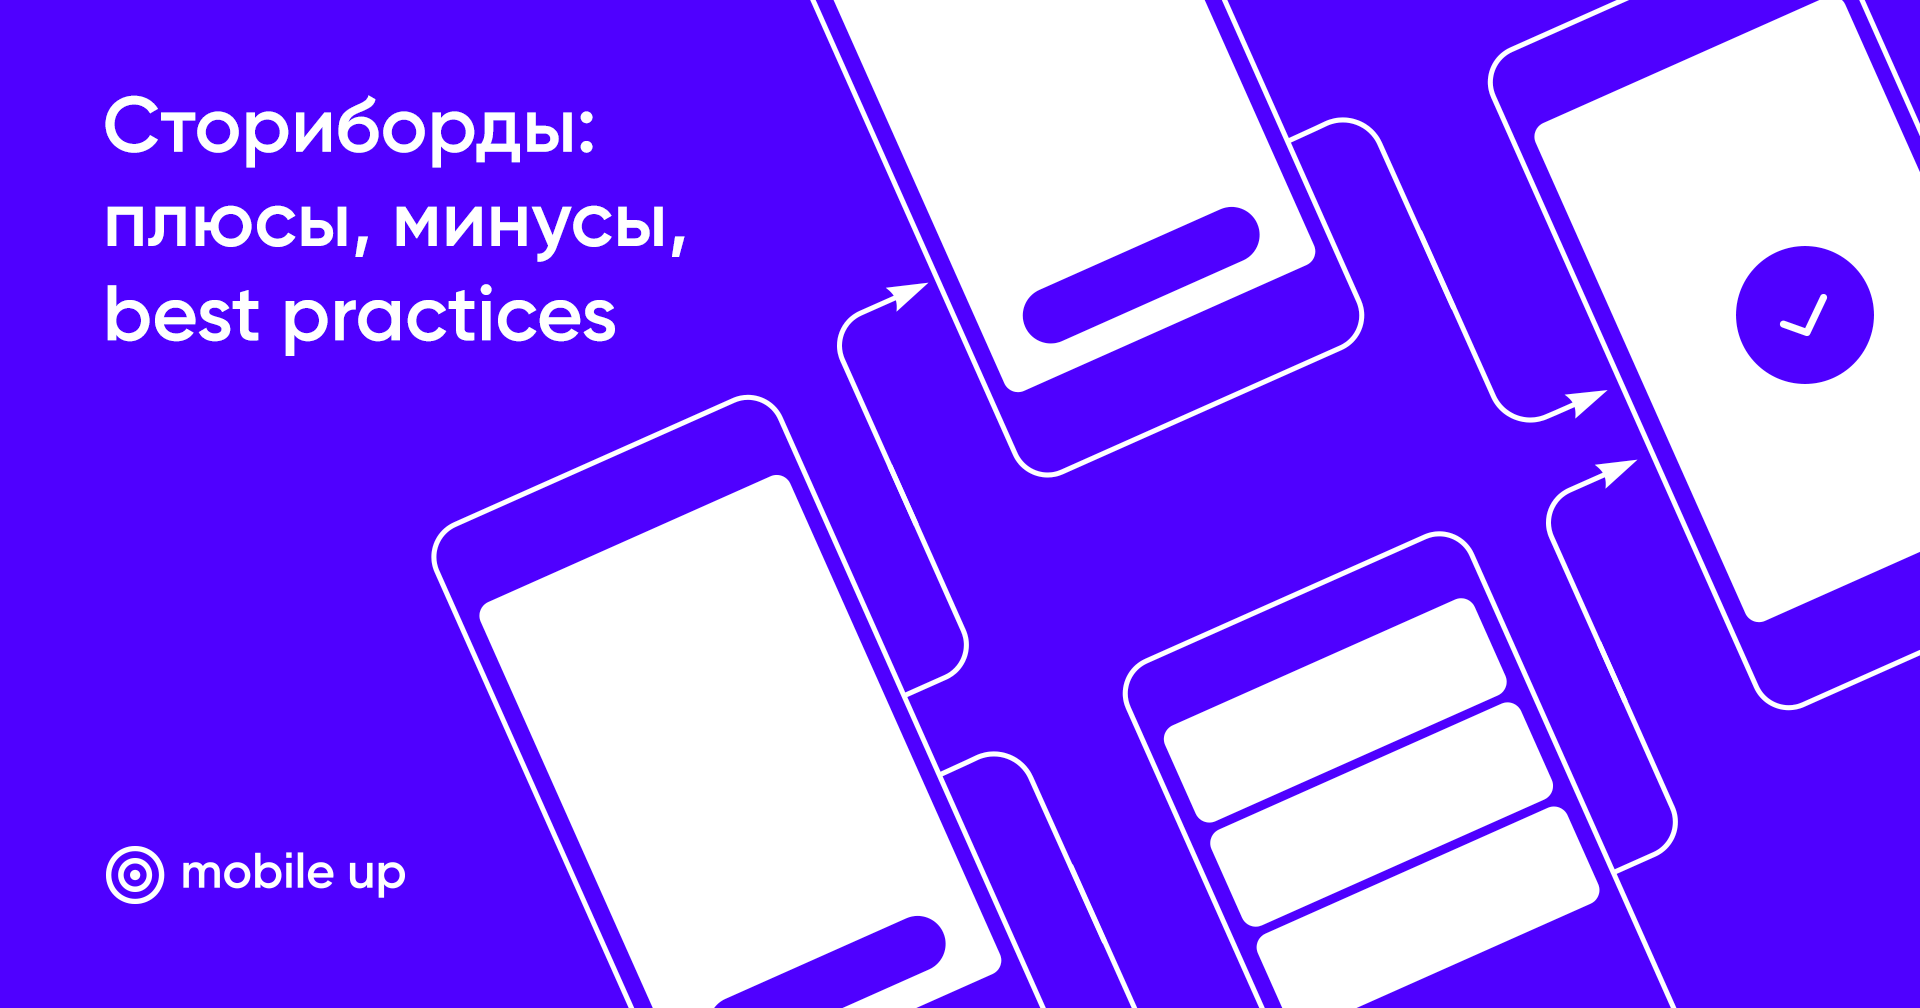 iOS Storyboards: анализ плюсов и минусов, best practices - 1